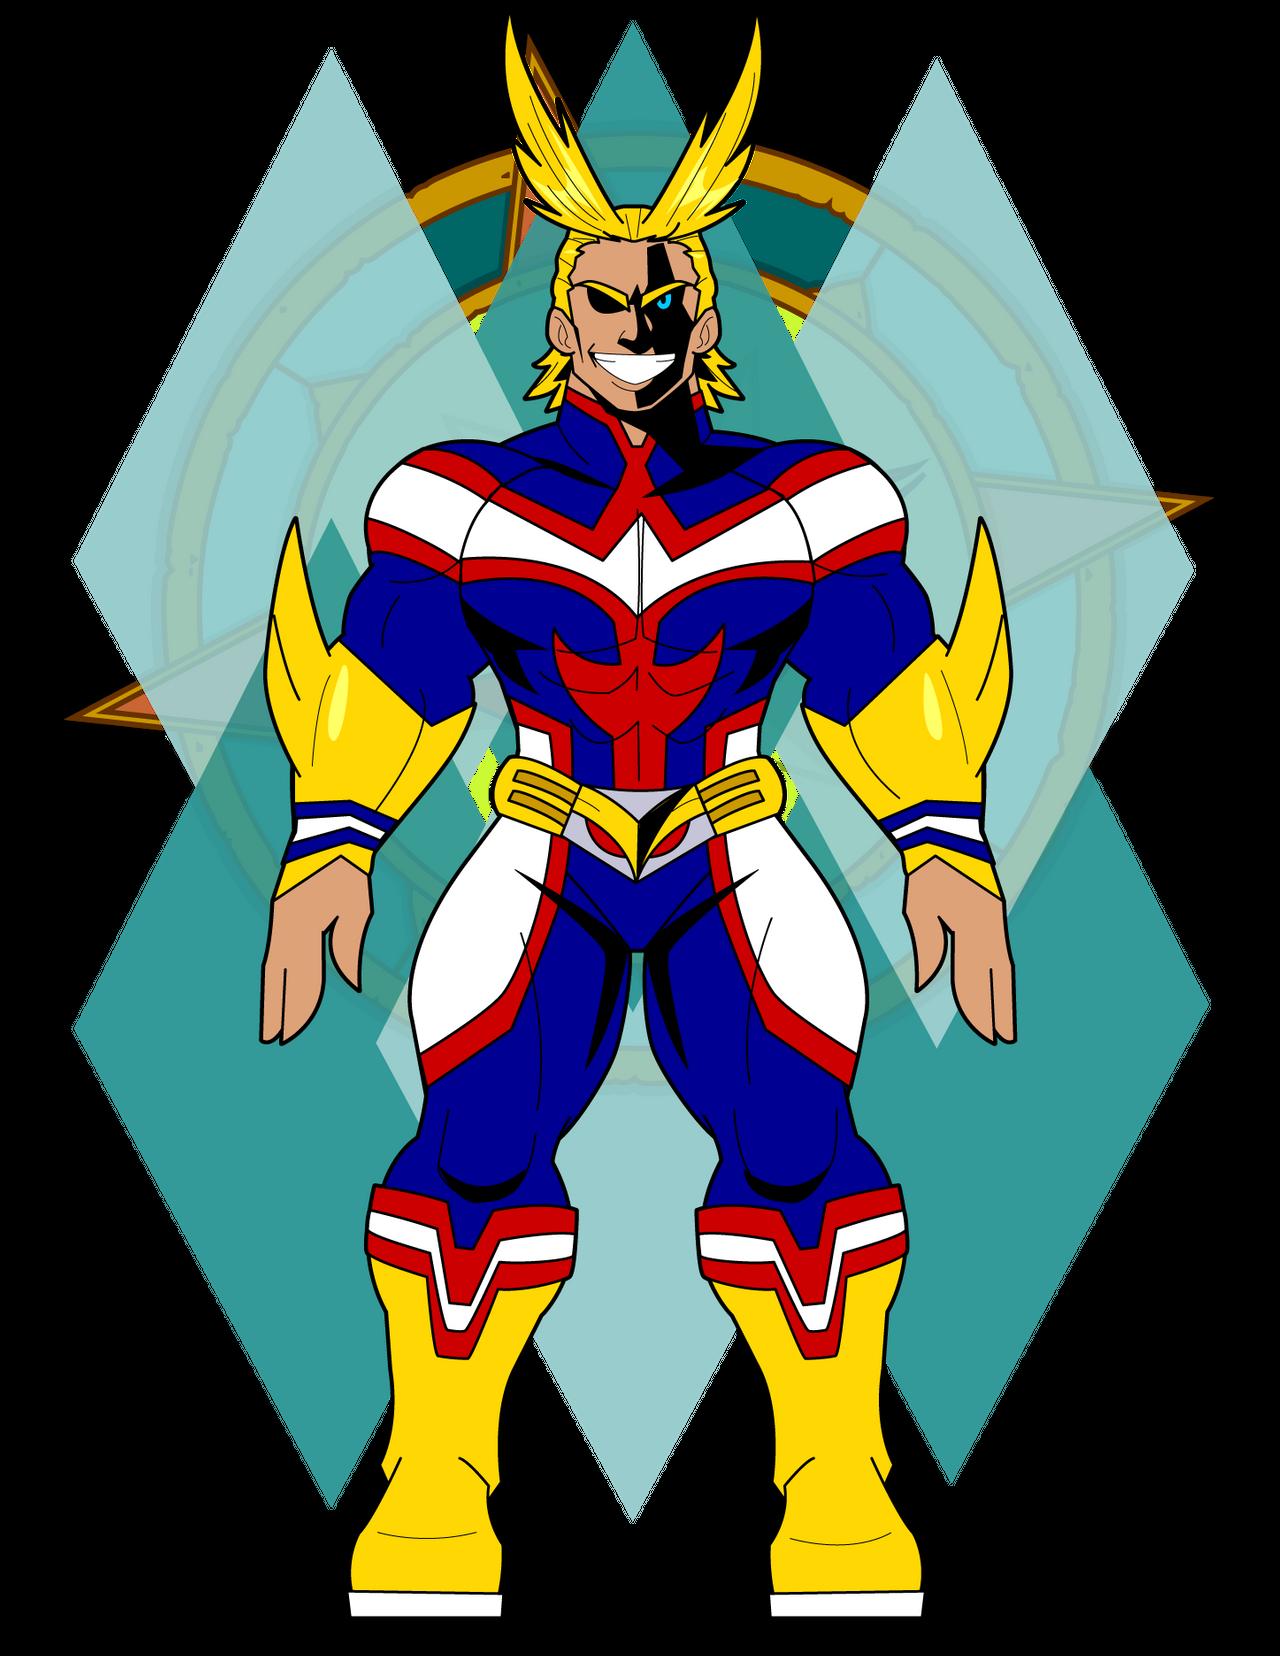 All Might Base By Dragon Fangx On Deviantart Artist Deviantart My Hero